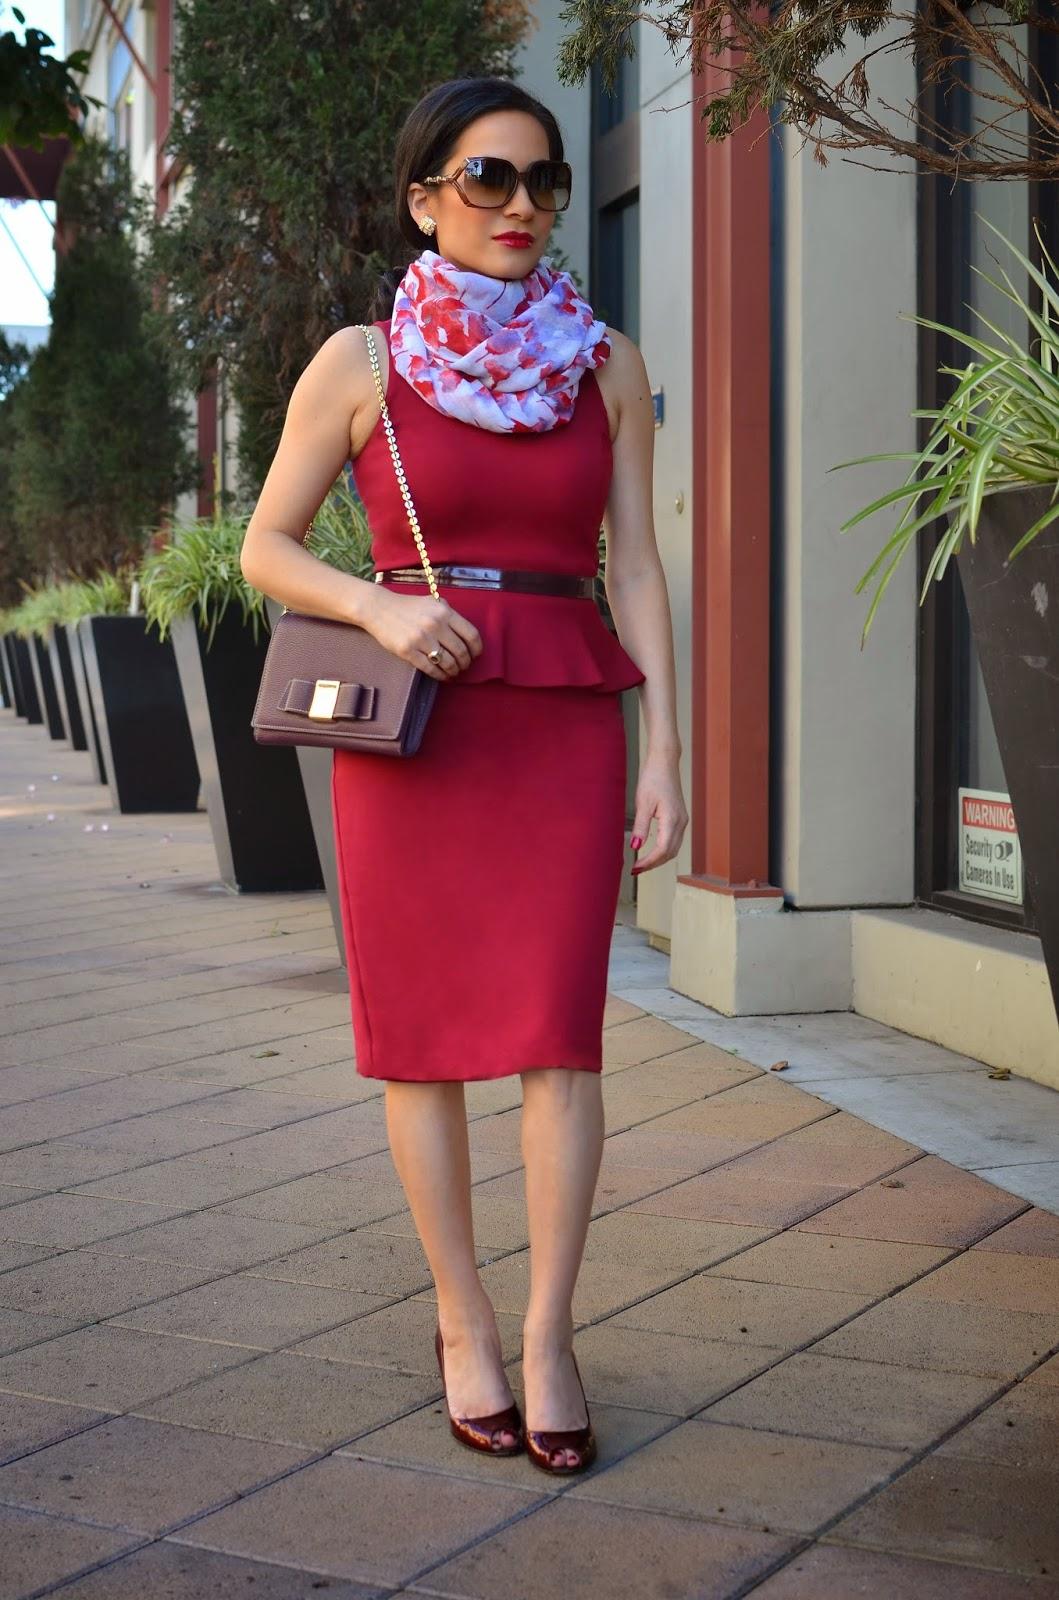 Armani Exchange Burgundy Peplum Dress Ivanka Trump Handbag Vera Wang Floral Scarf Maroon Stuart Weitzman Heels Gucci Sunglasses